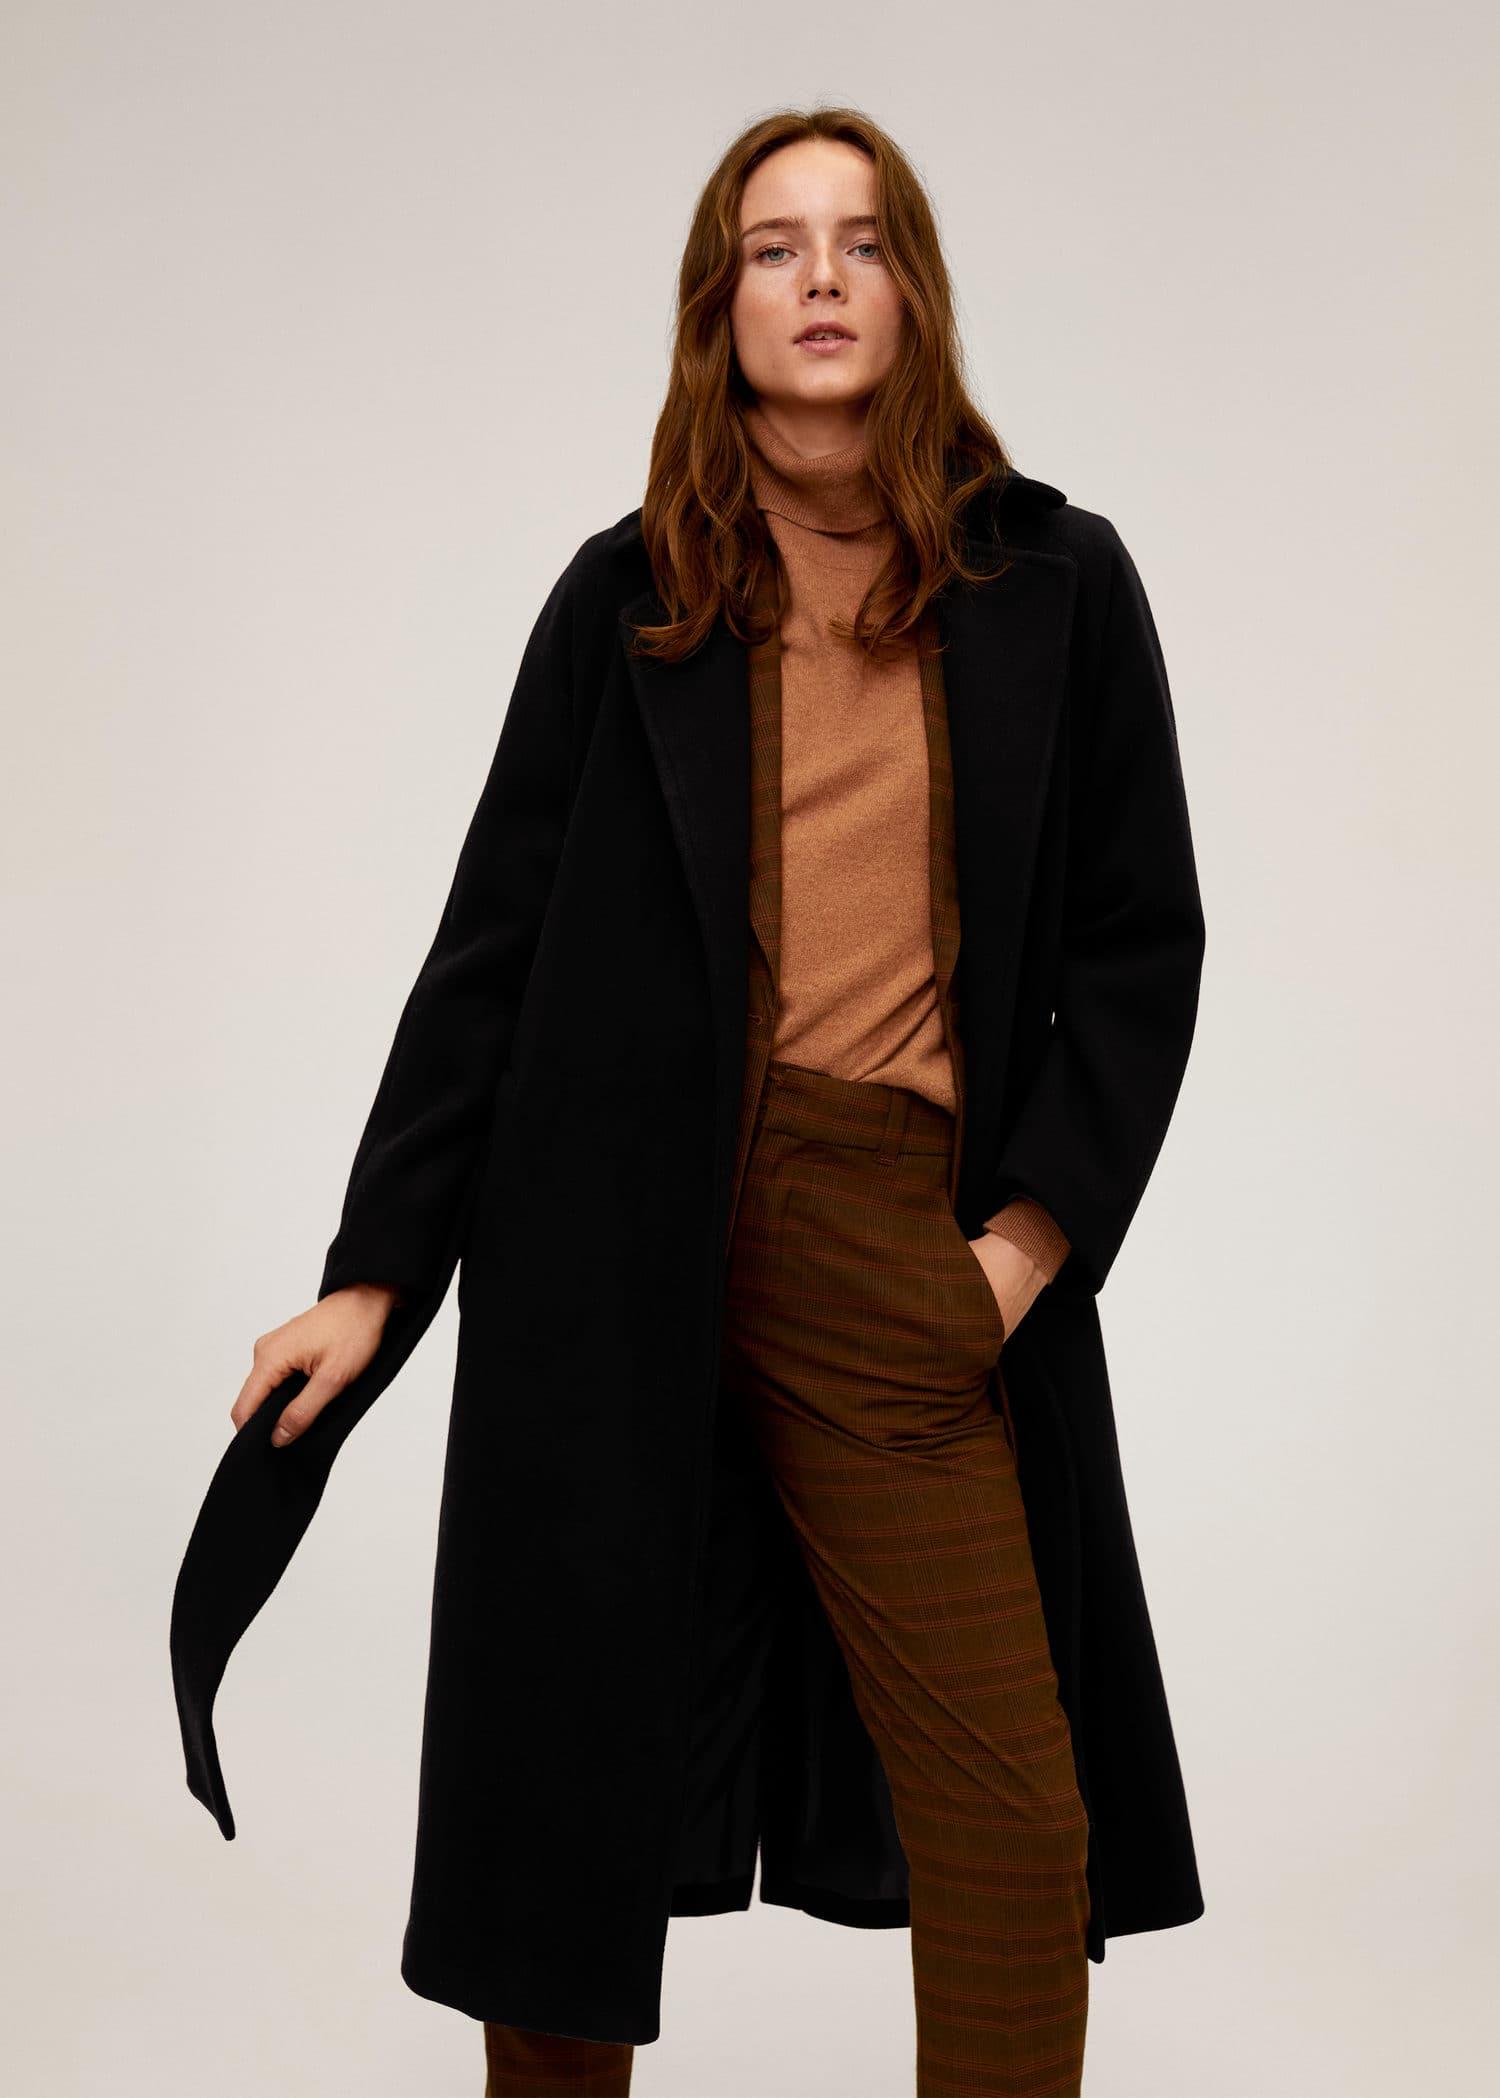 Access Denied | Coats for women, Wool coat women, Coat